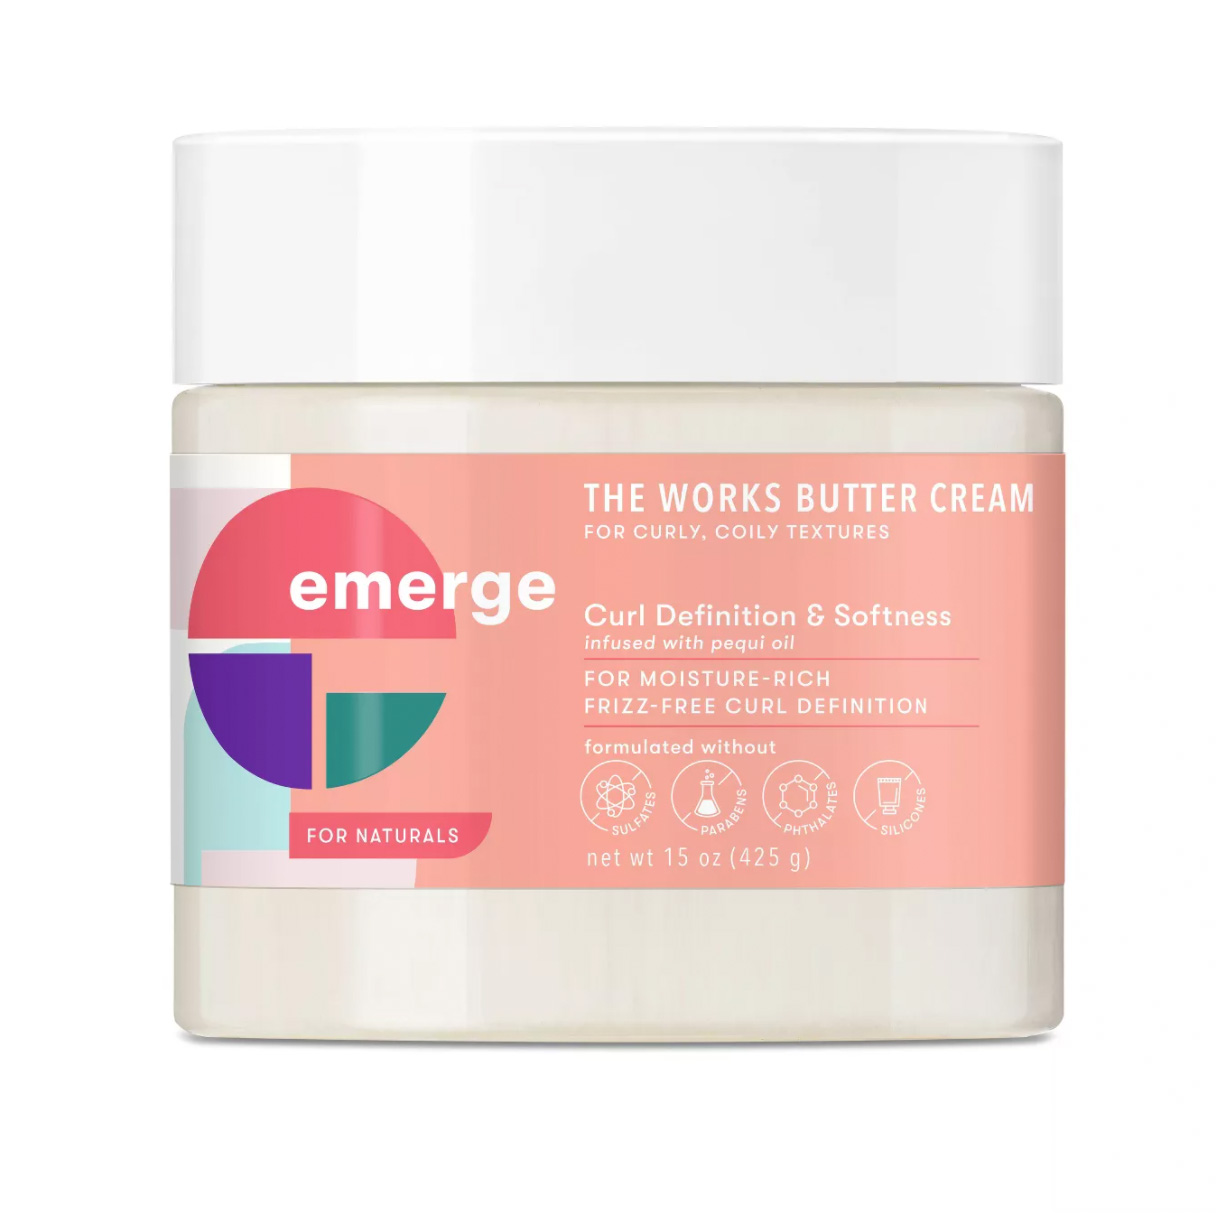 winter hair care 4a 4b 4c moisturizing styling